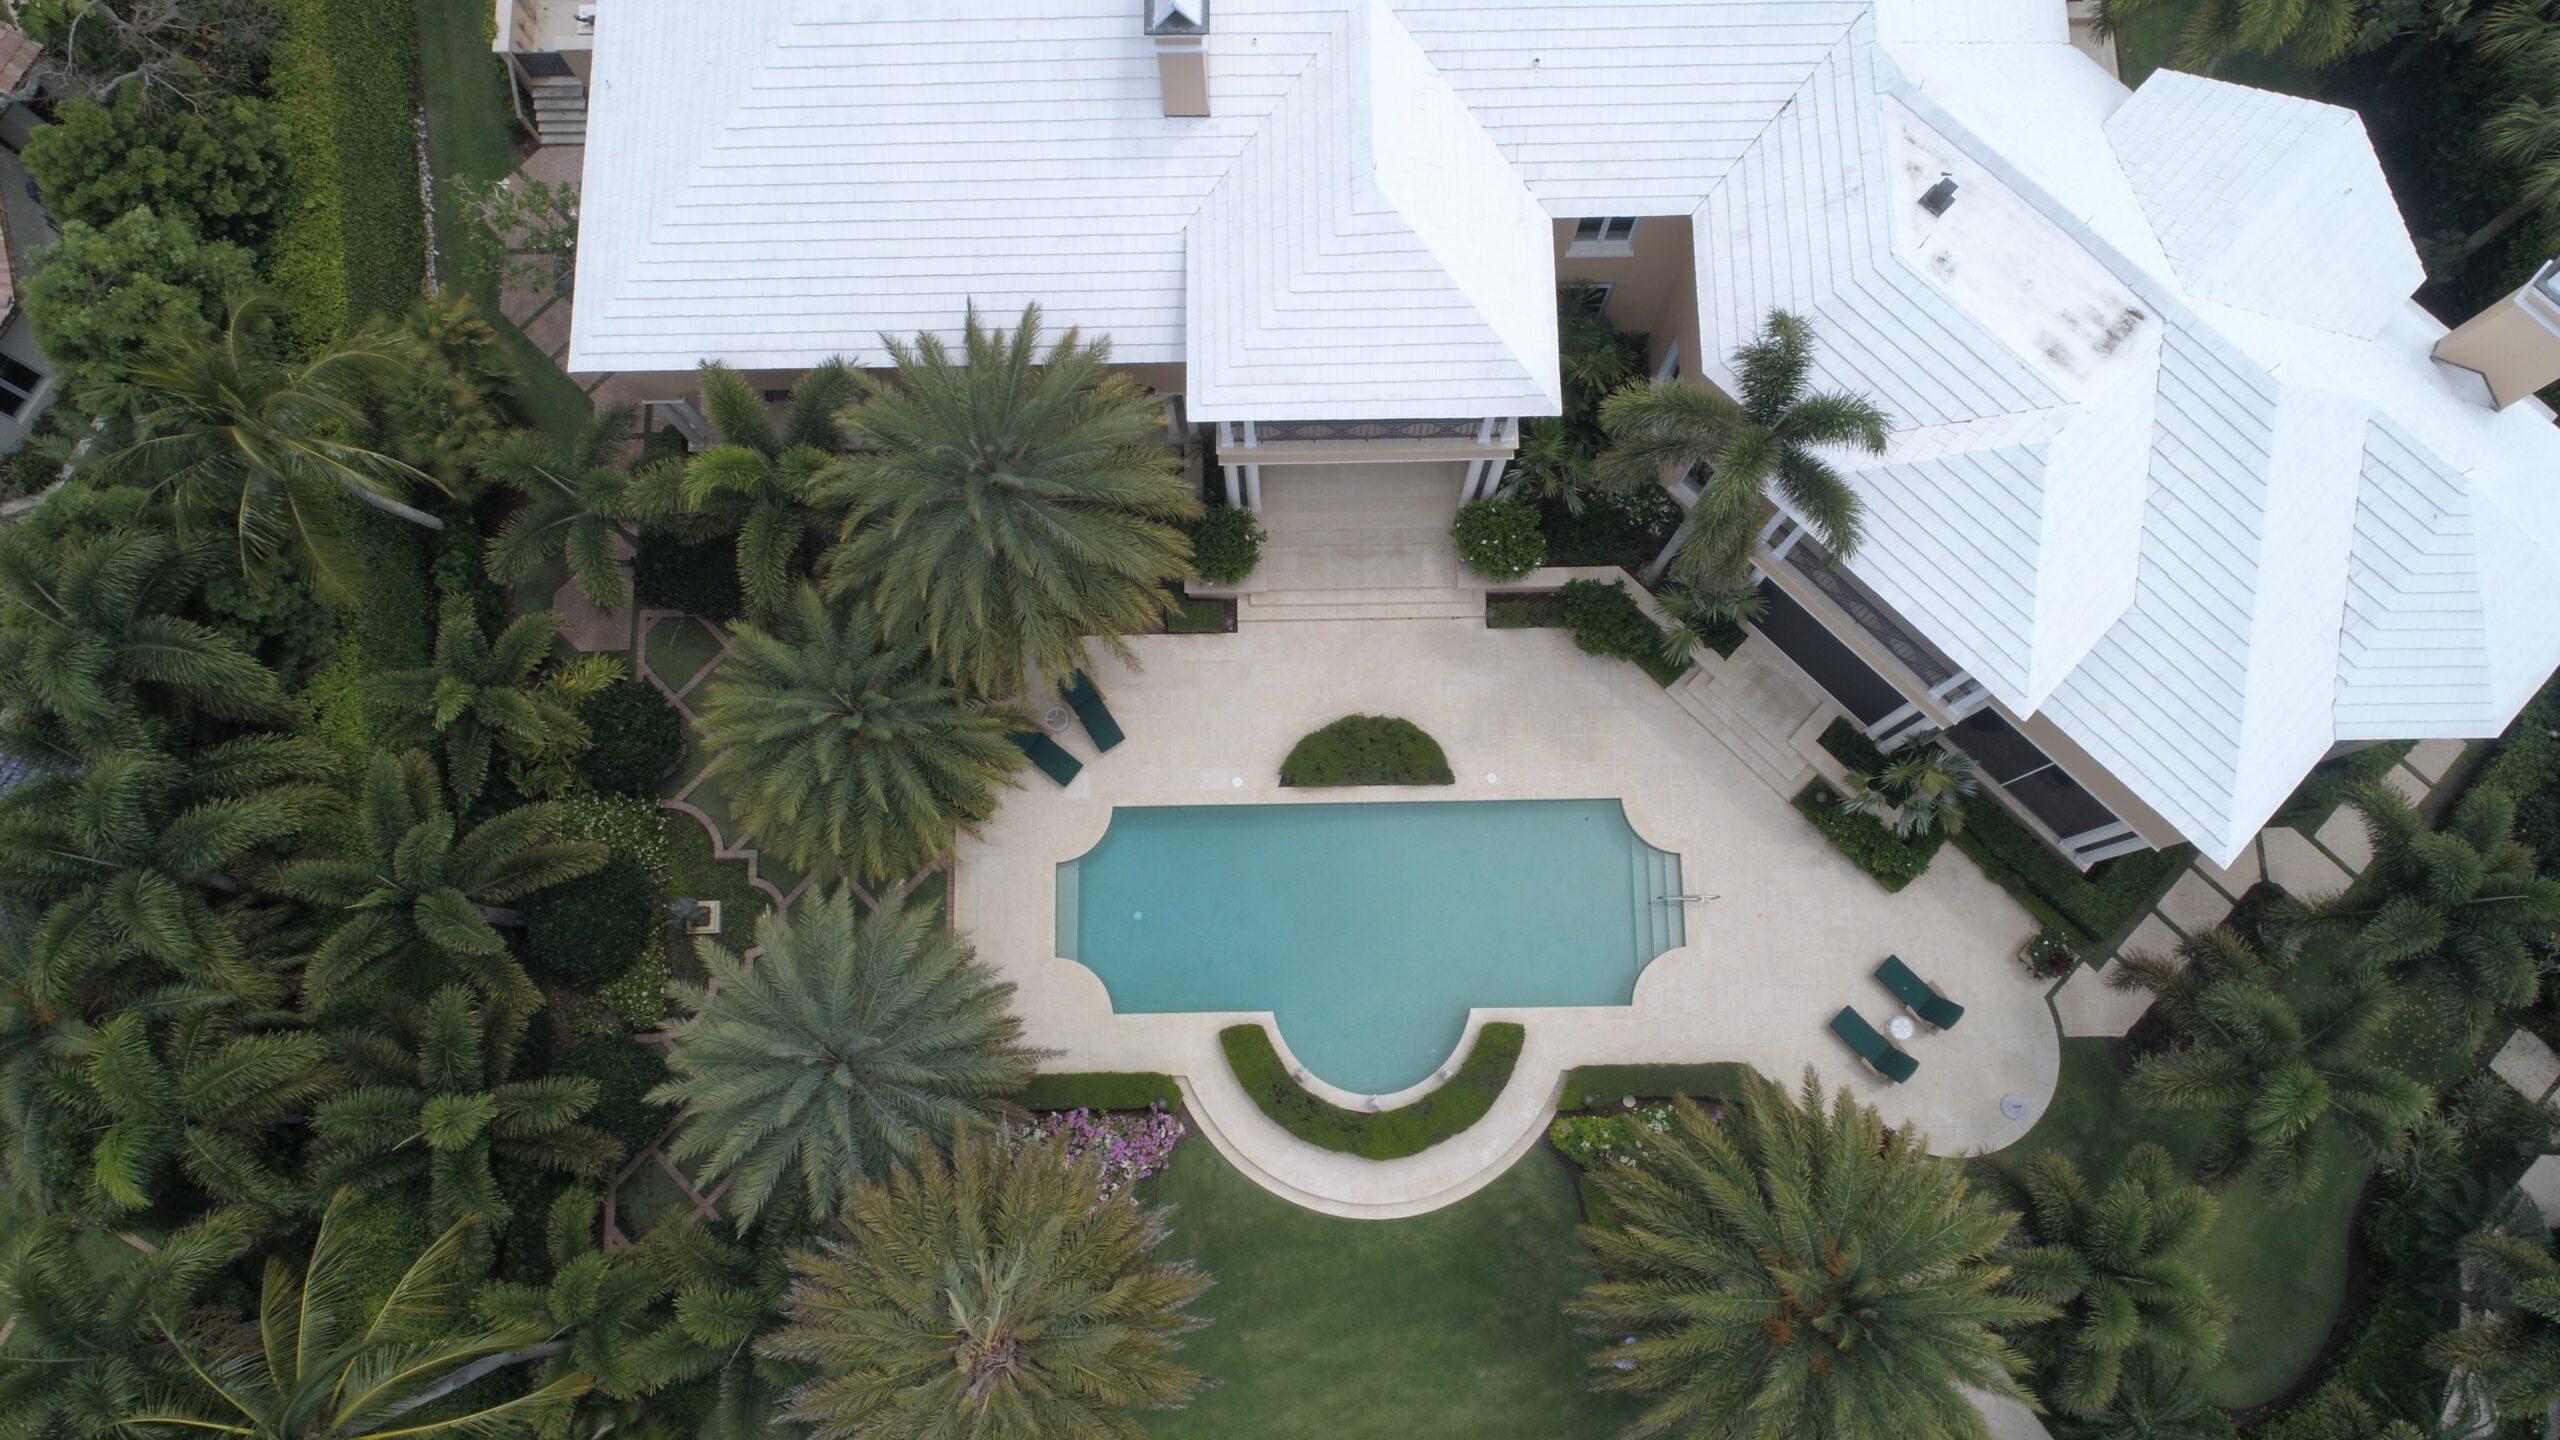 Backyard Pool in Home